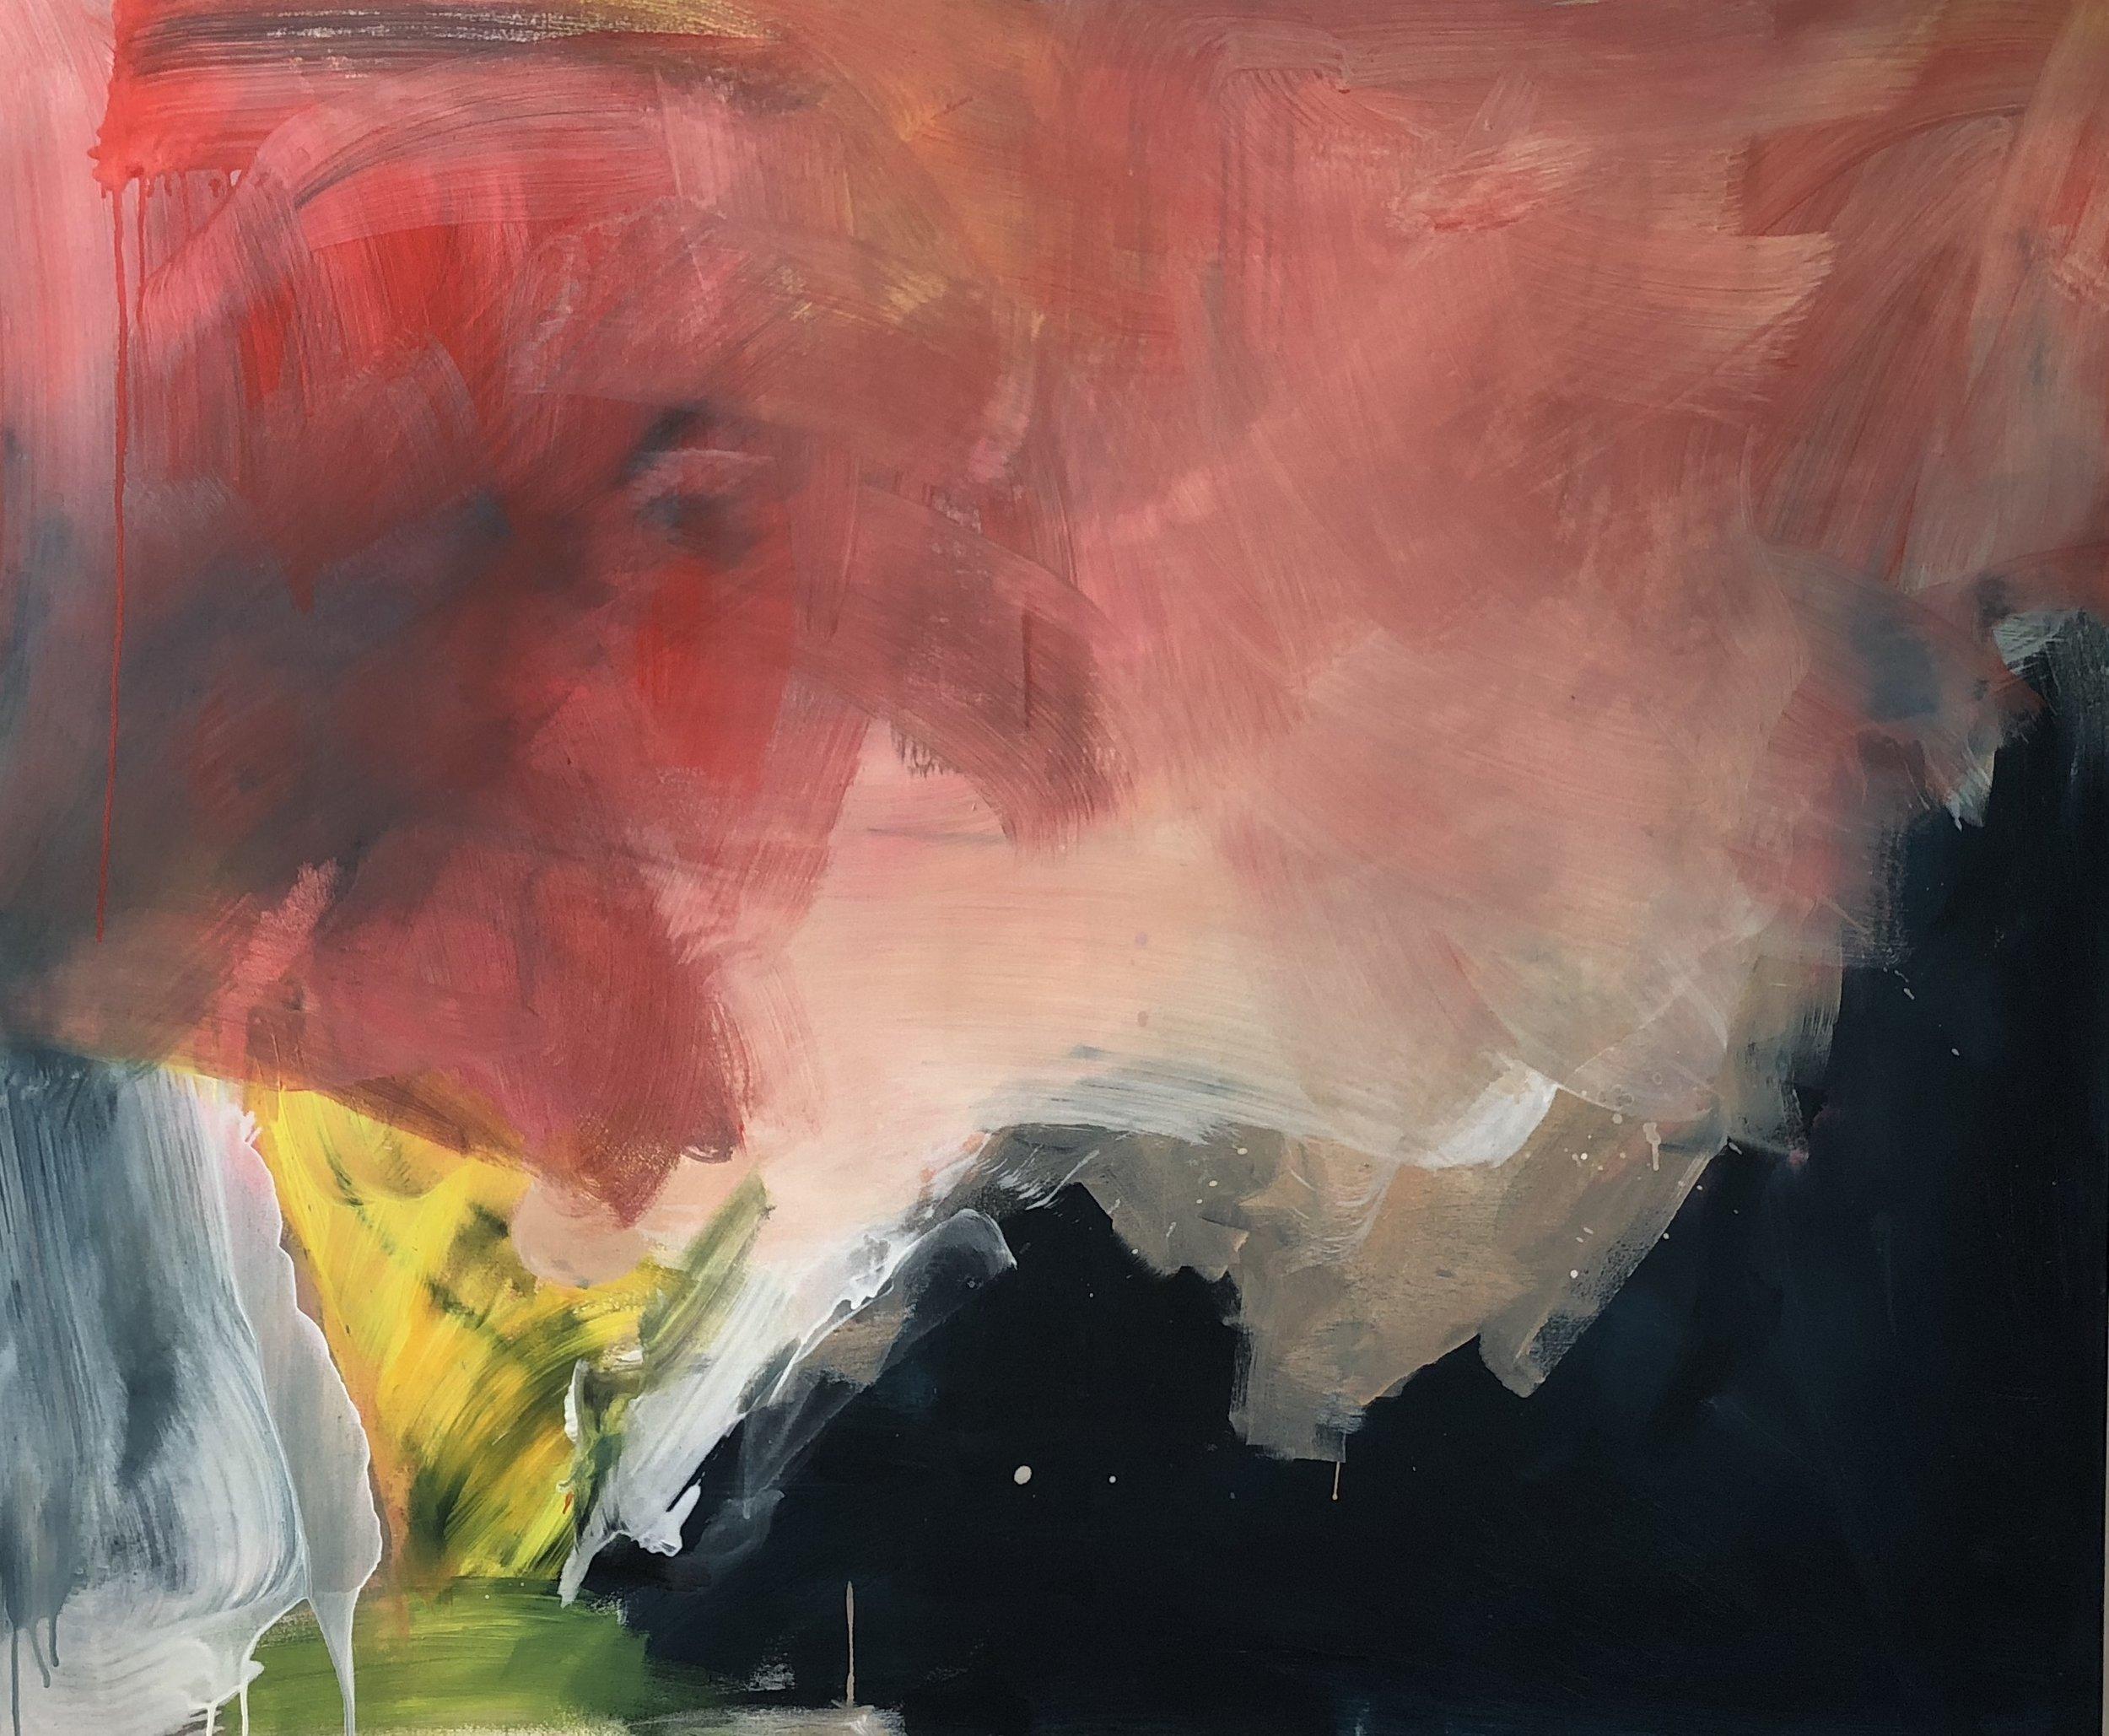 Untitled, 120cm x 80cm, Acrylic on canvas